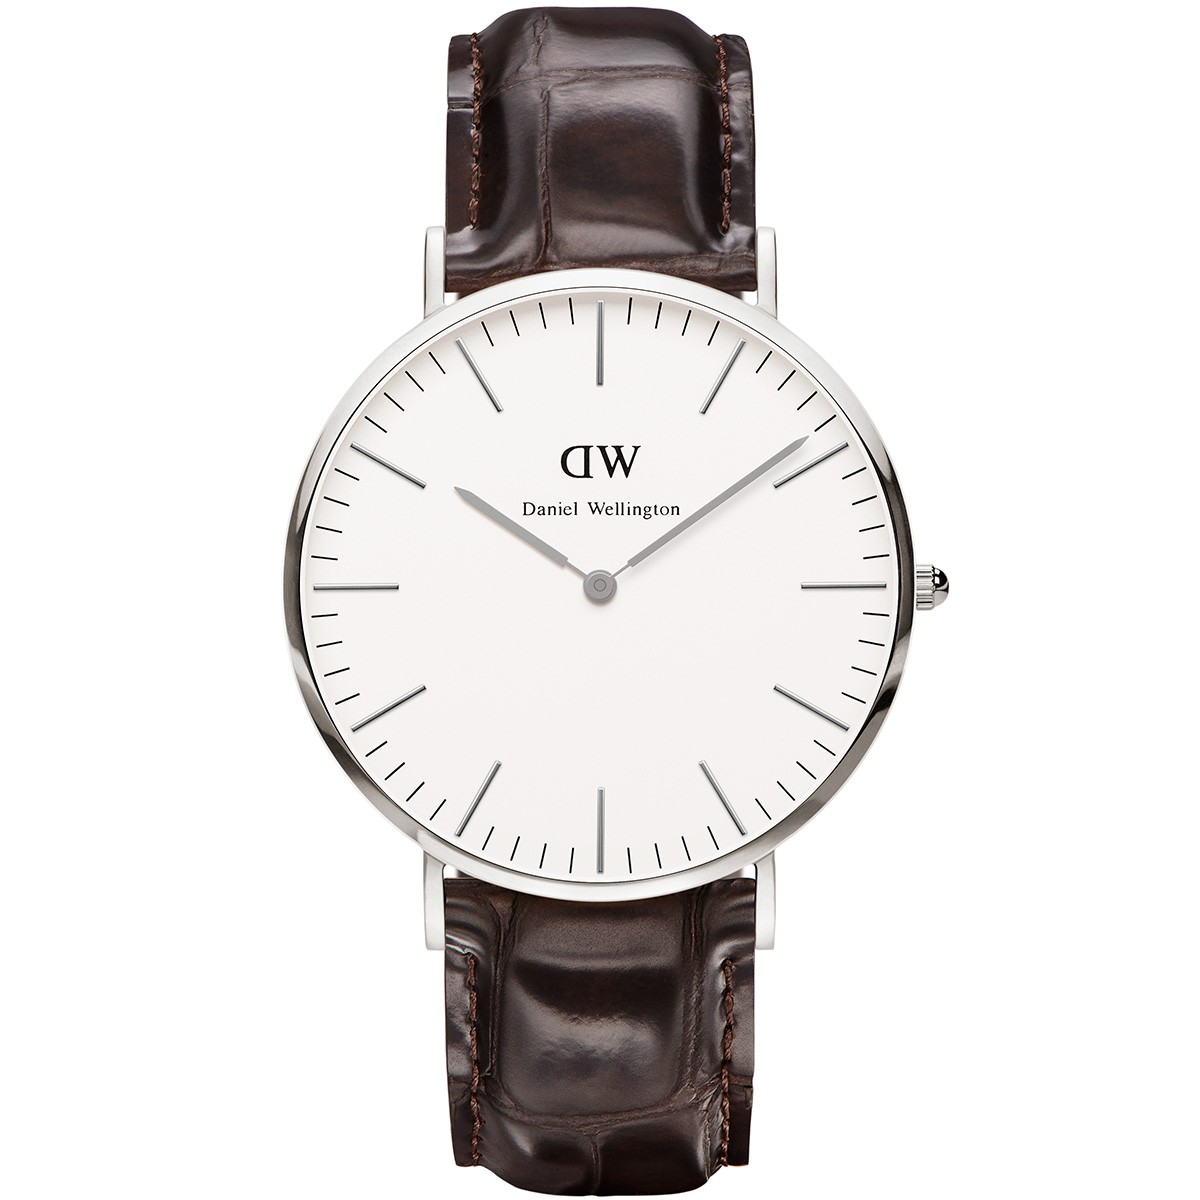 Reloj DANIEL WELLINGTON Hombre 0211DW RELOJES DANIEL WELLINGTON Ofertas c29d64610570